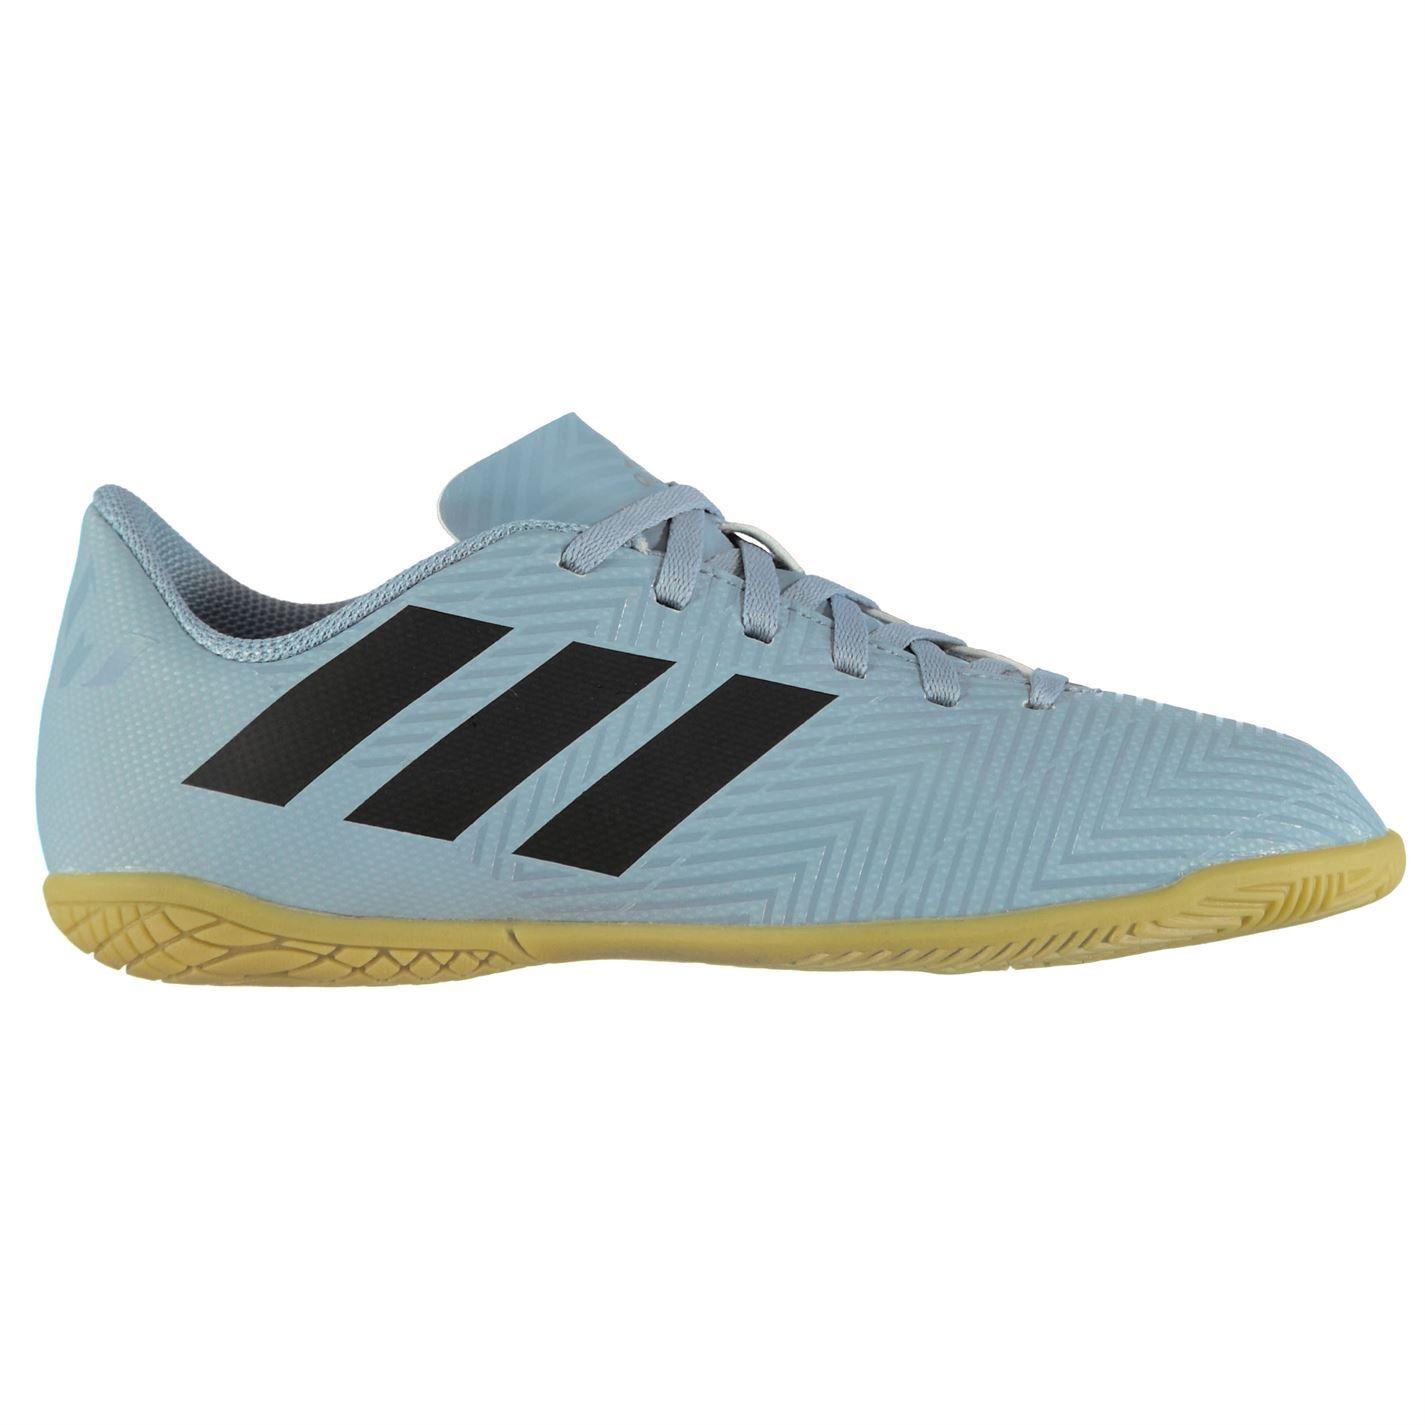 Messi Futsal Nemeziz In Chaussure Adidas Tango 18 4 De